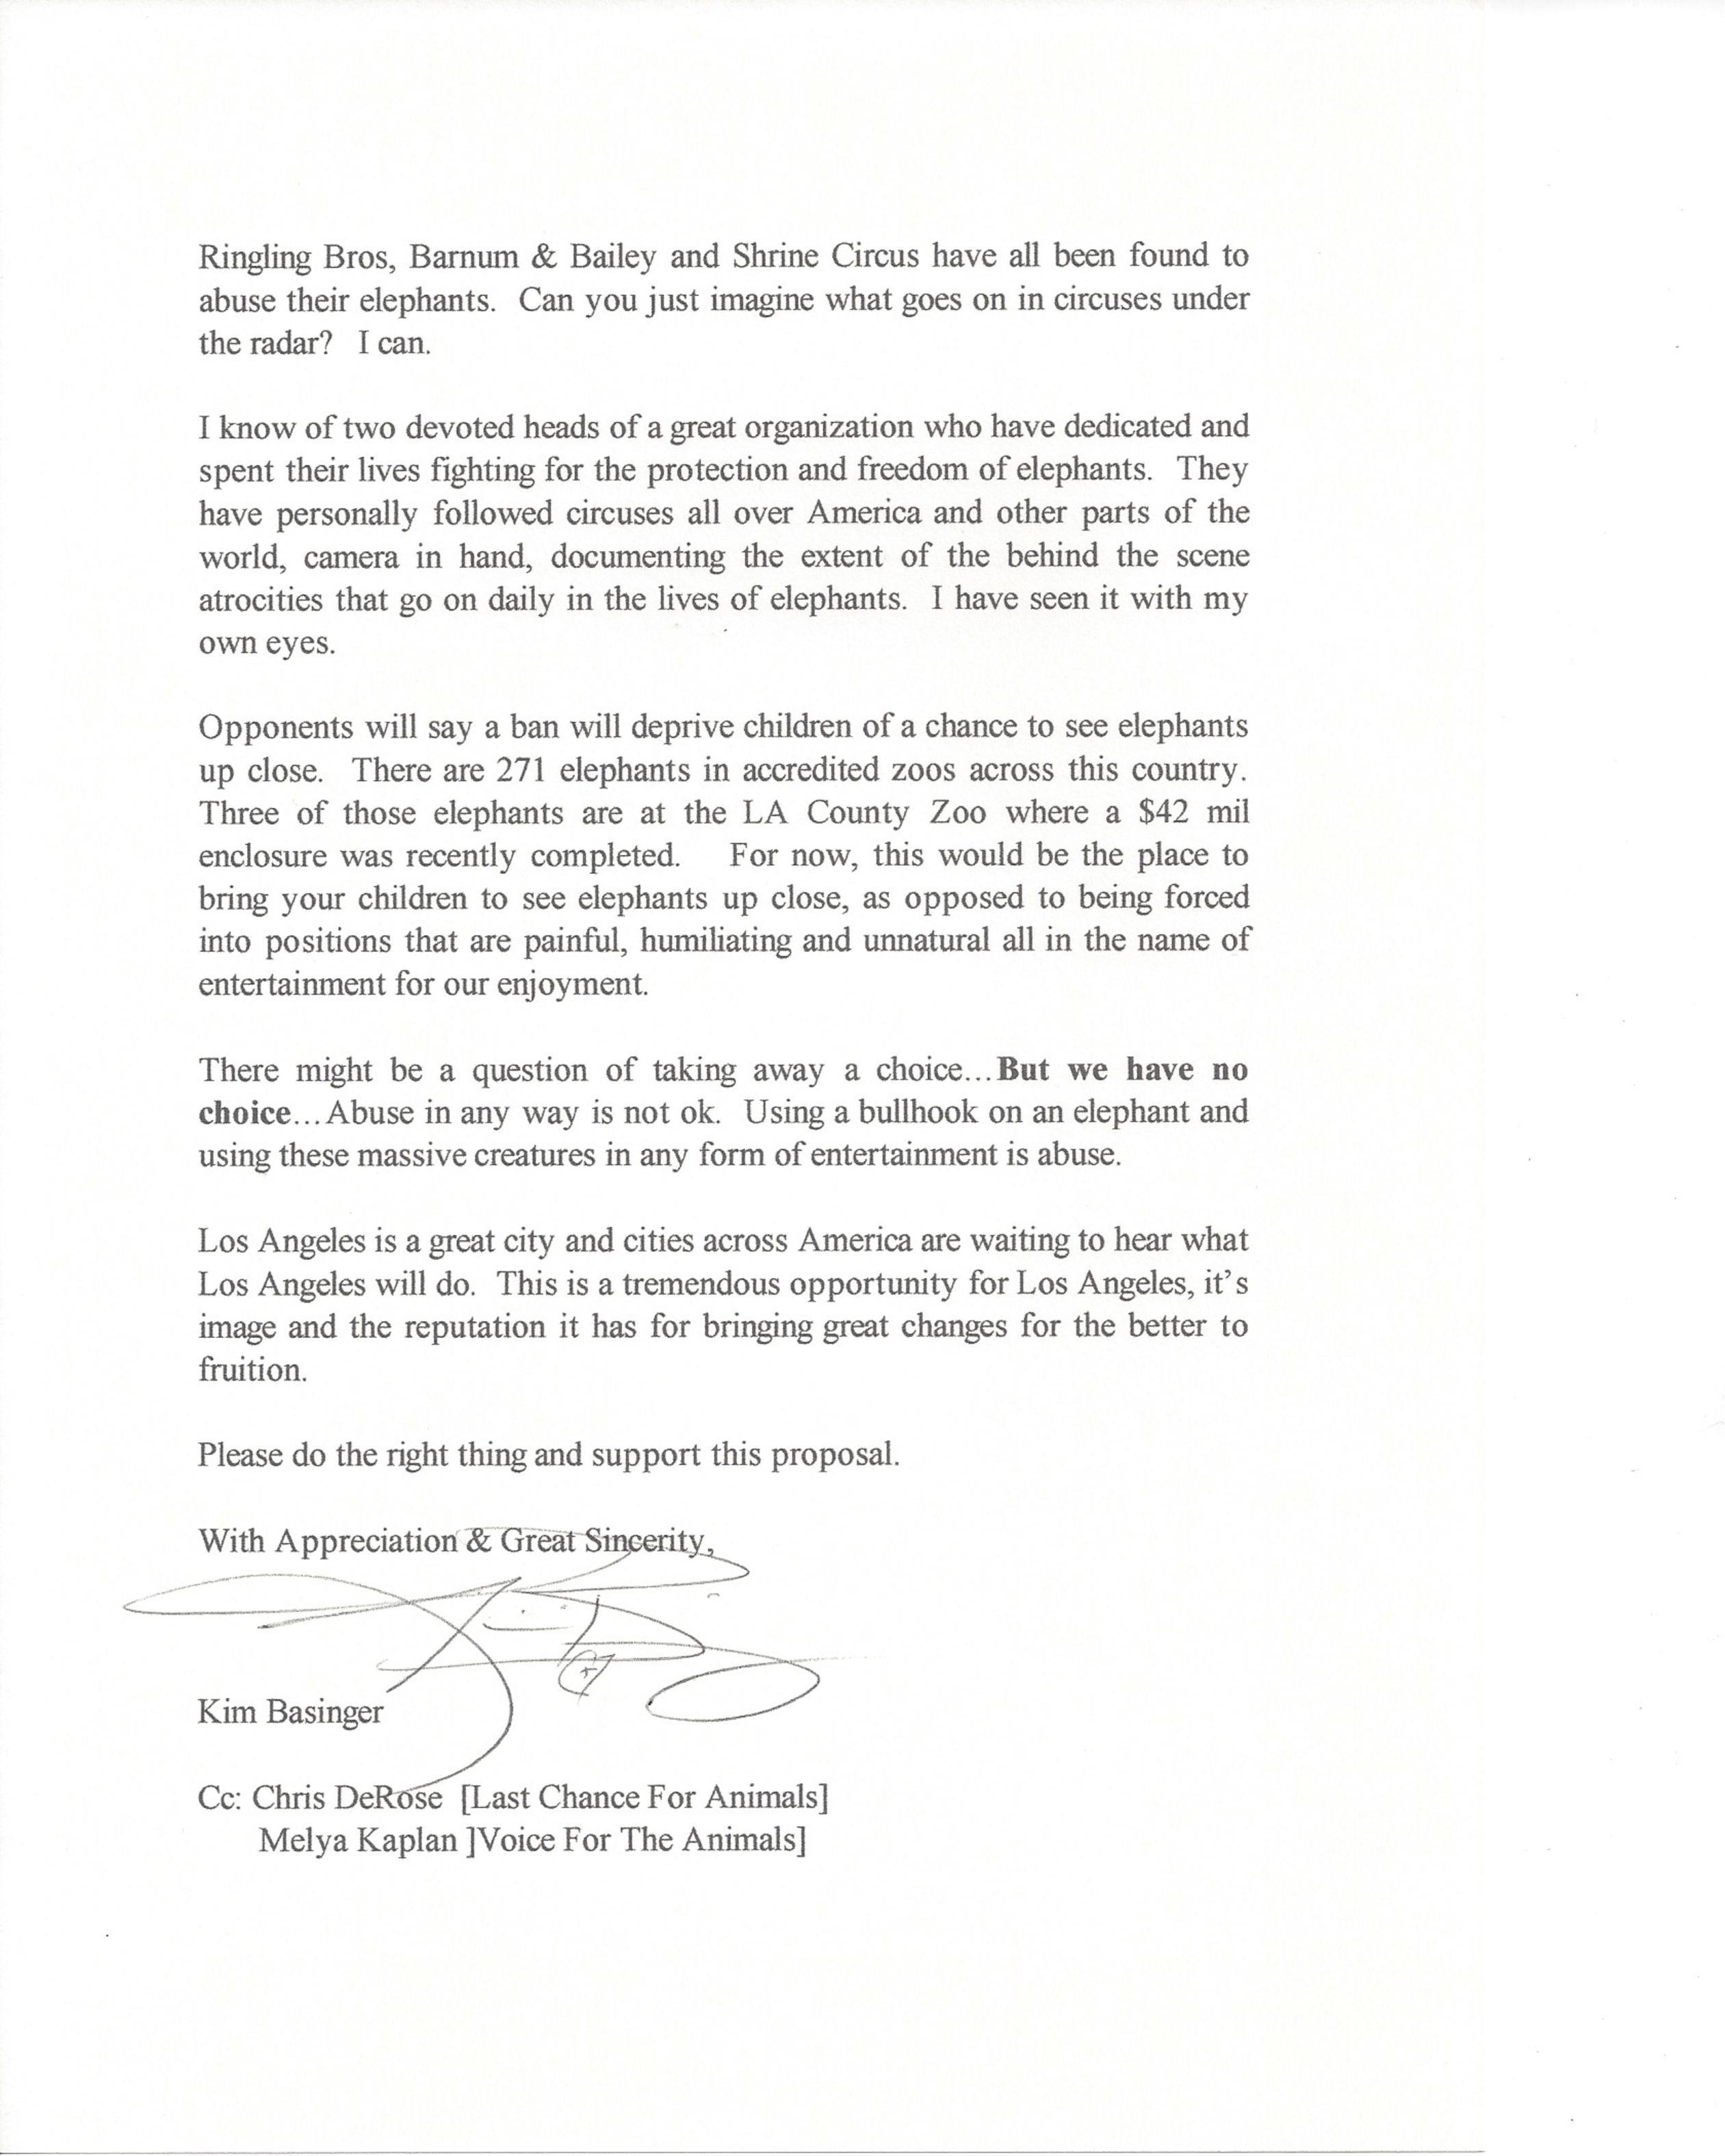 Kim_Basinger_Letter-page-002.jpg